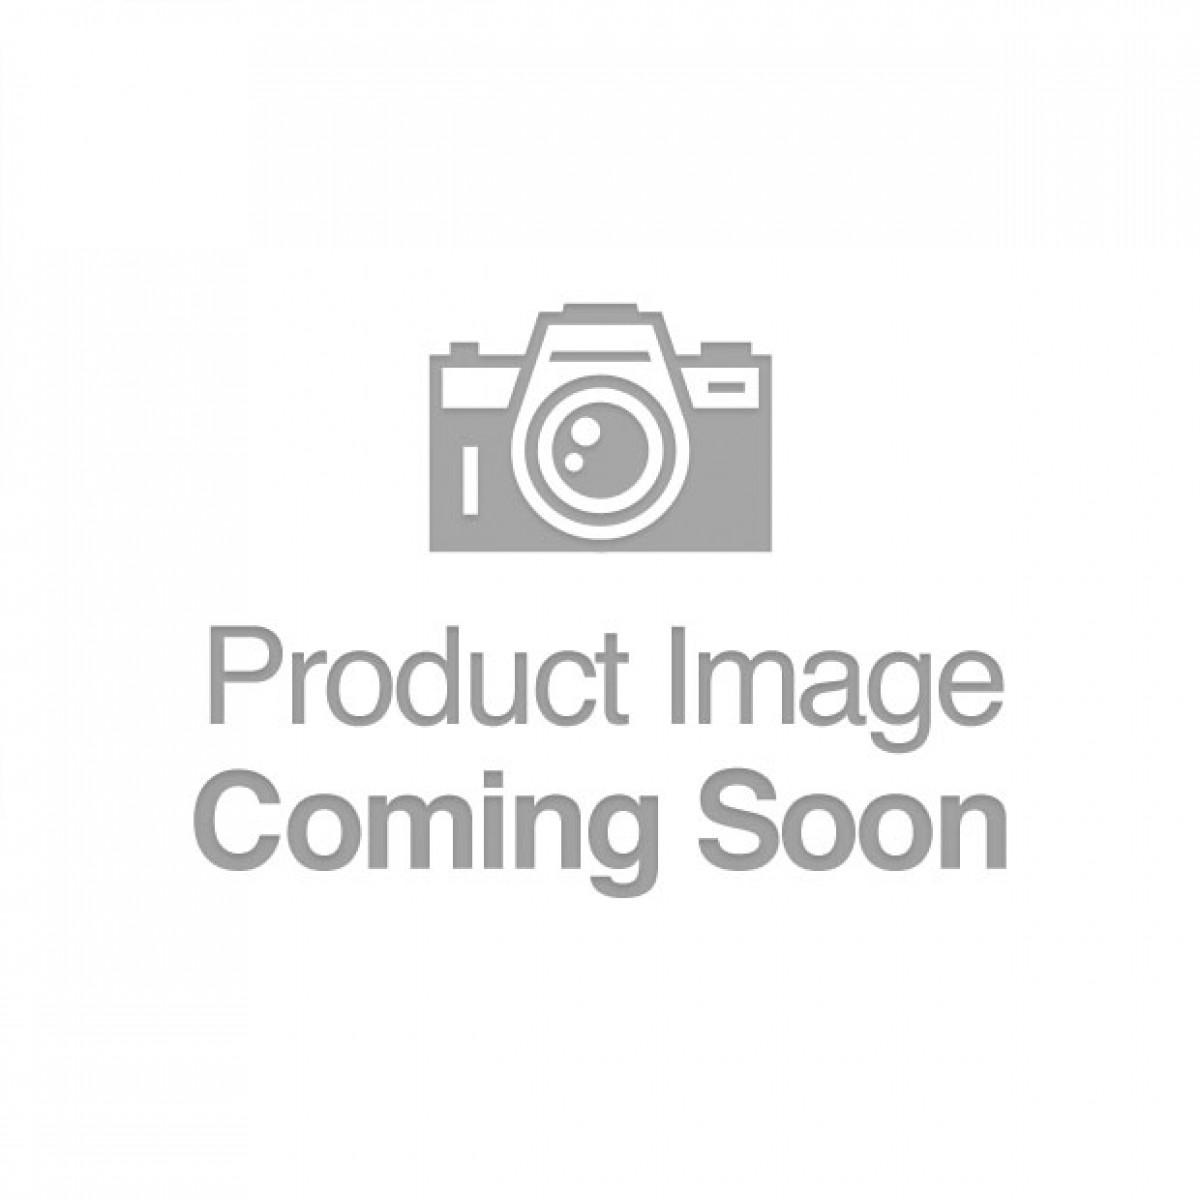 Doc Johnson Alkaline Batteries - Aaa 4 Pack